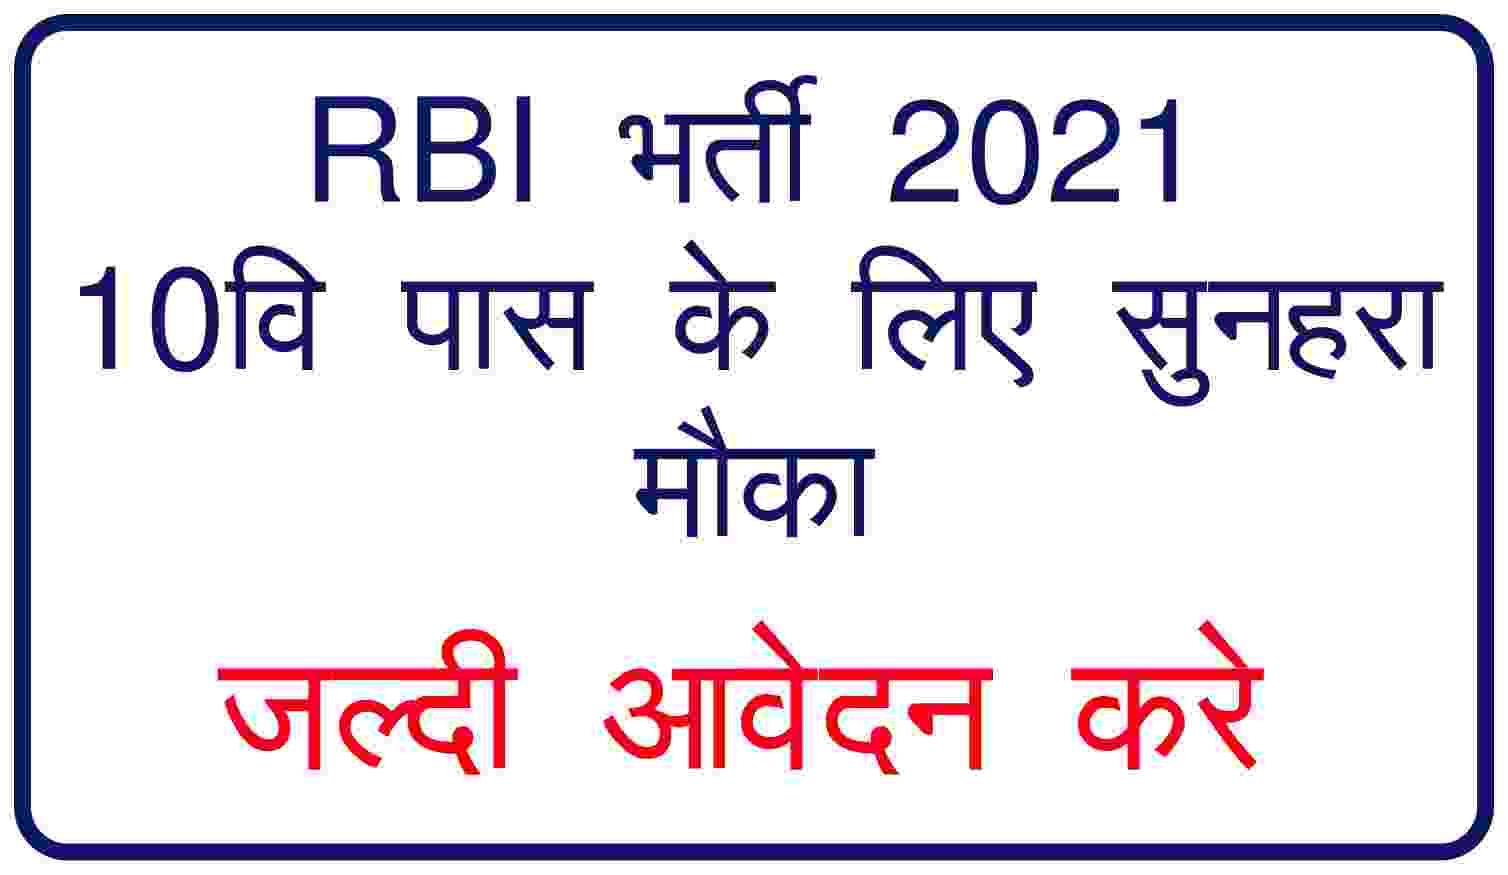 RBI Bharti 2021: RBI Office Attendant Vacancy 2021